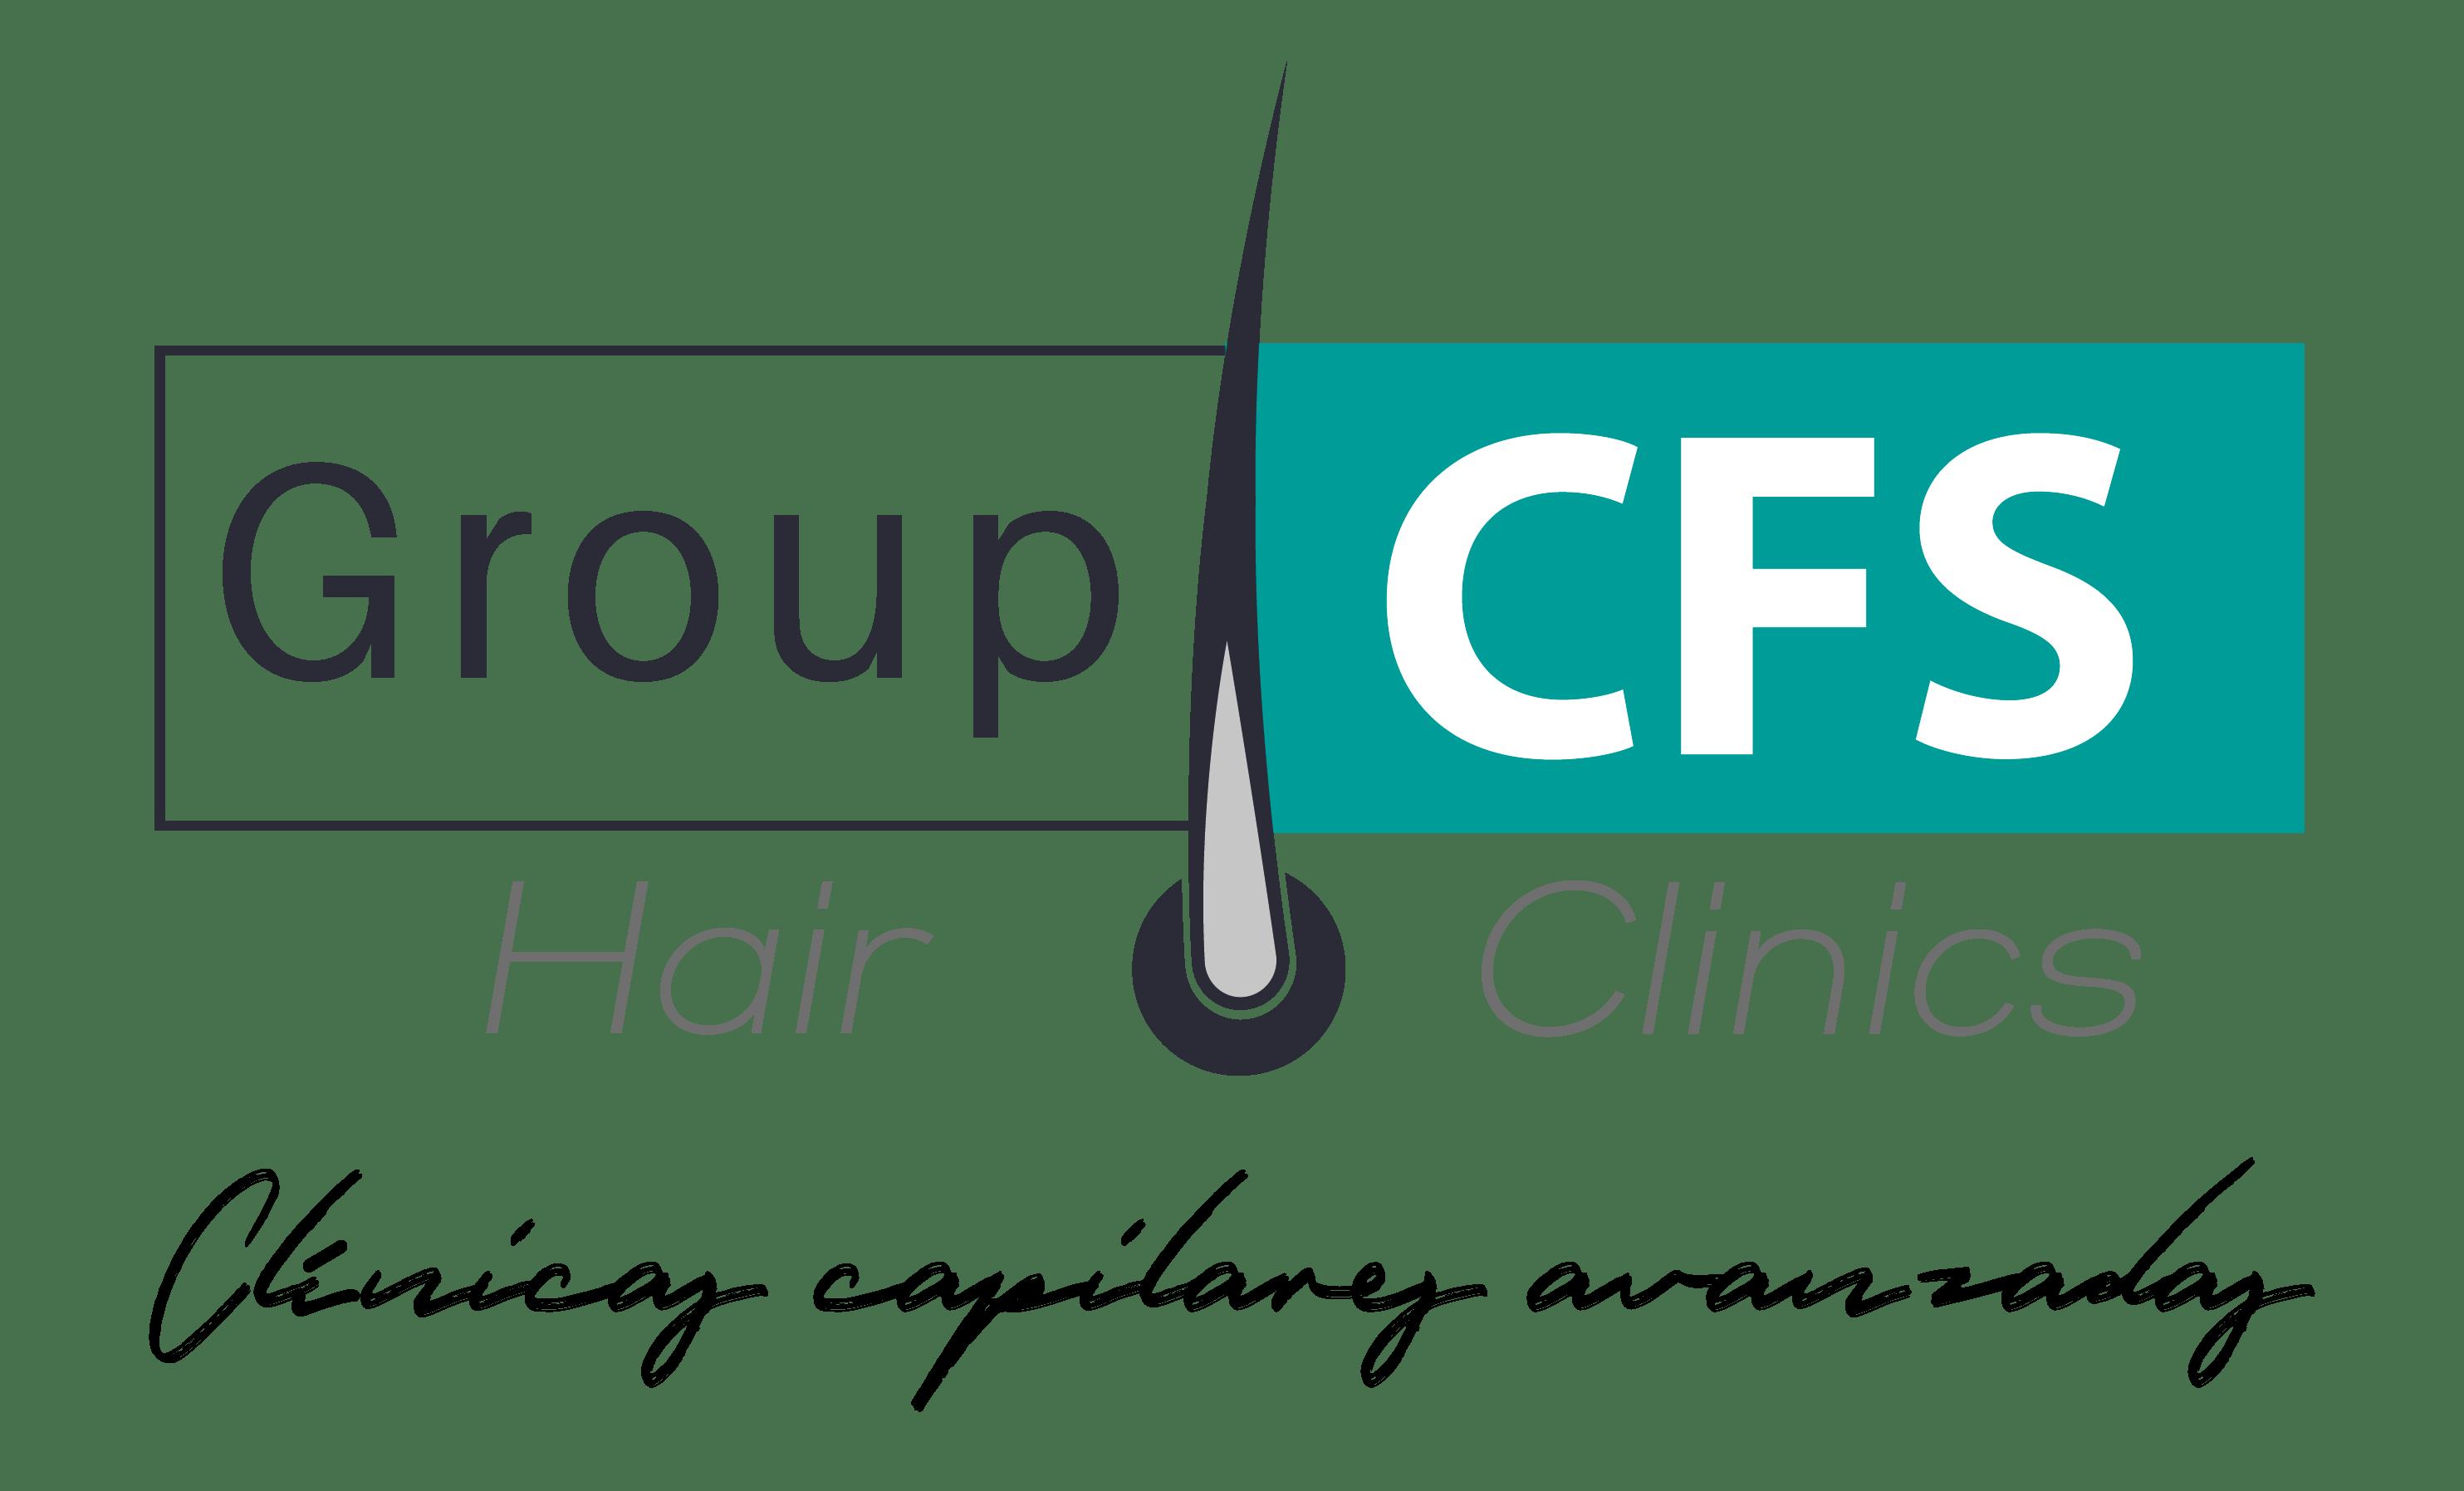 Grupo CFS Hair Clinics - Clinicas Capilares Avanzadas